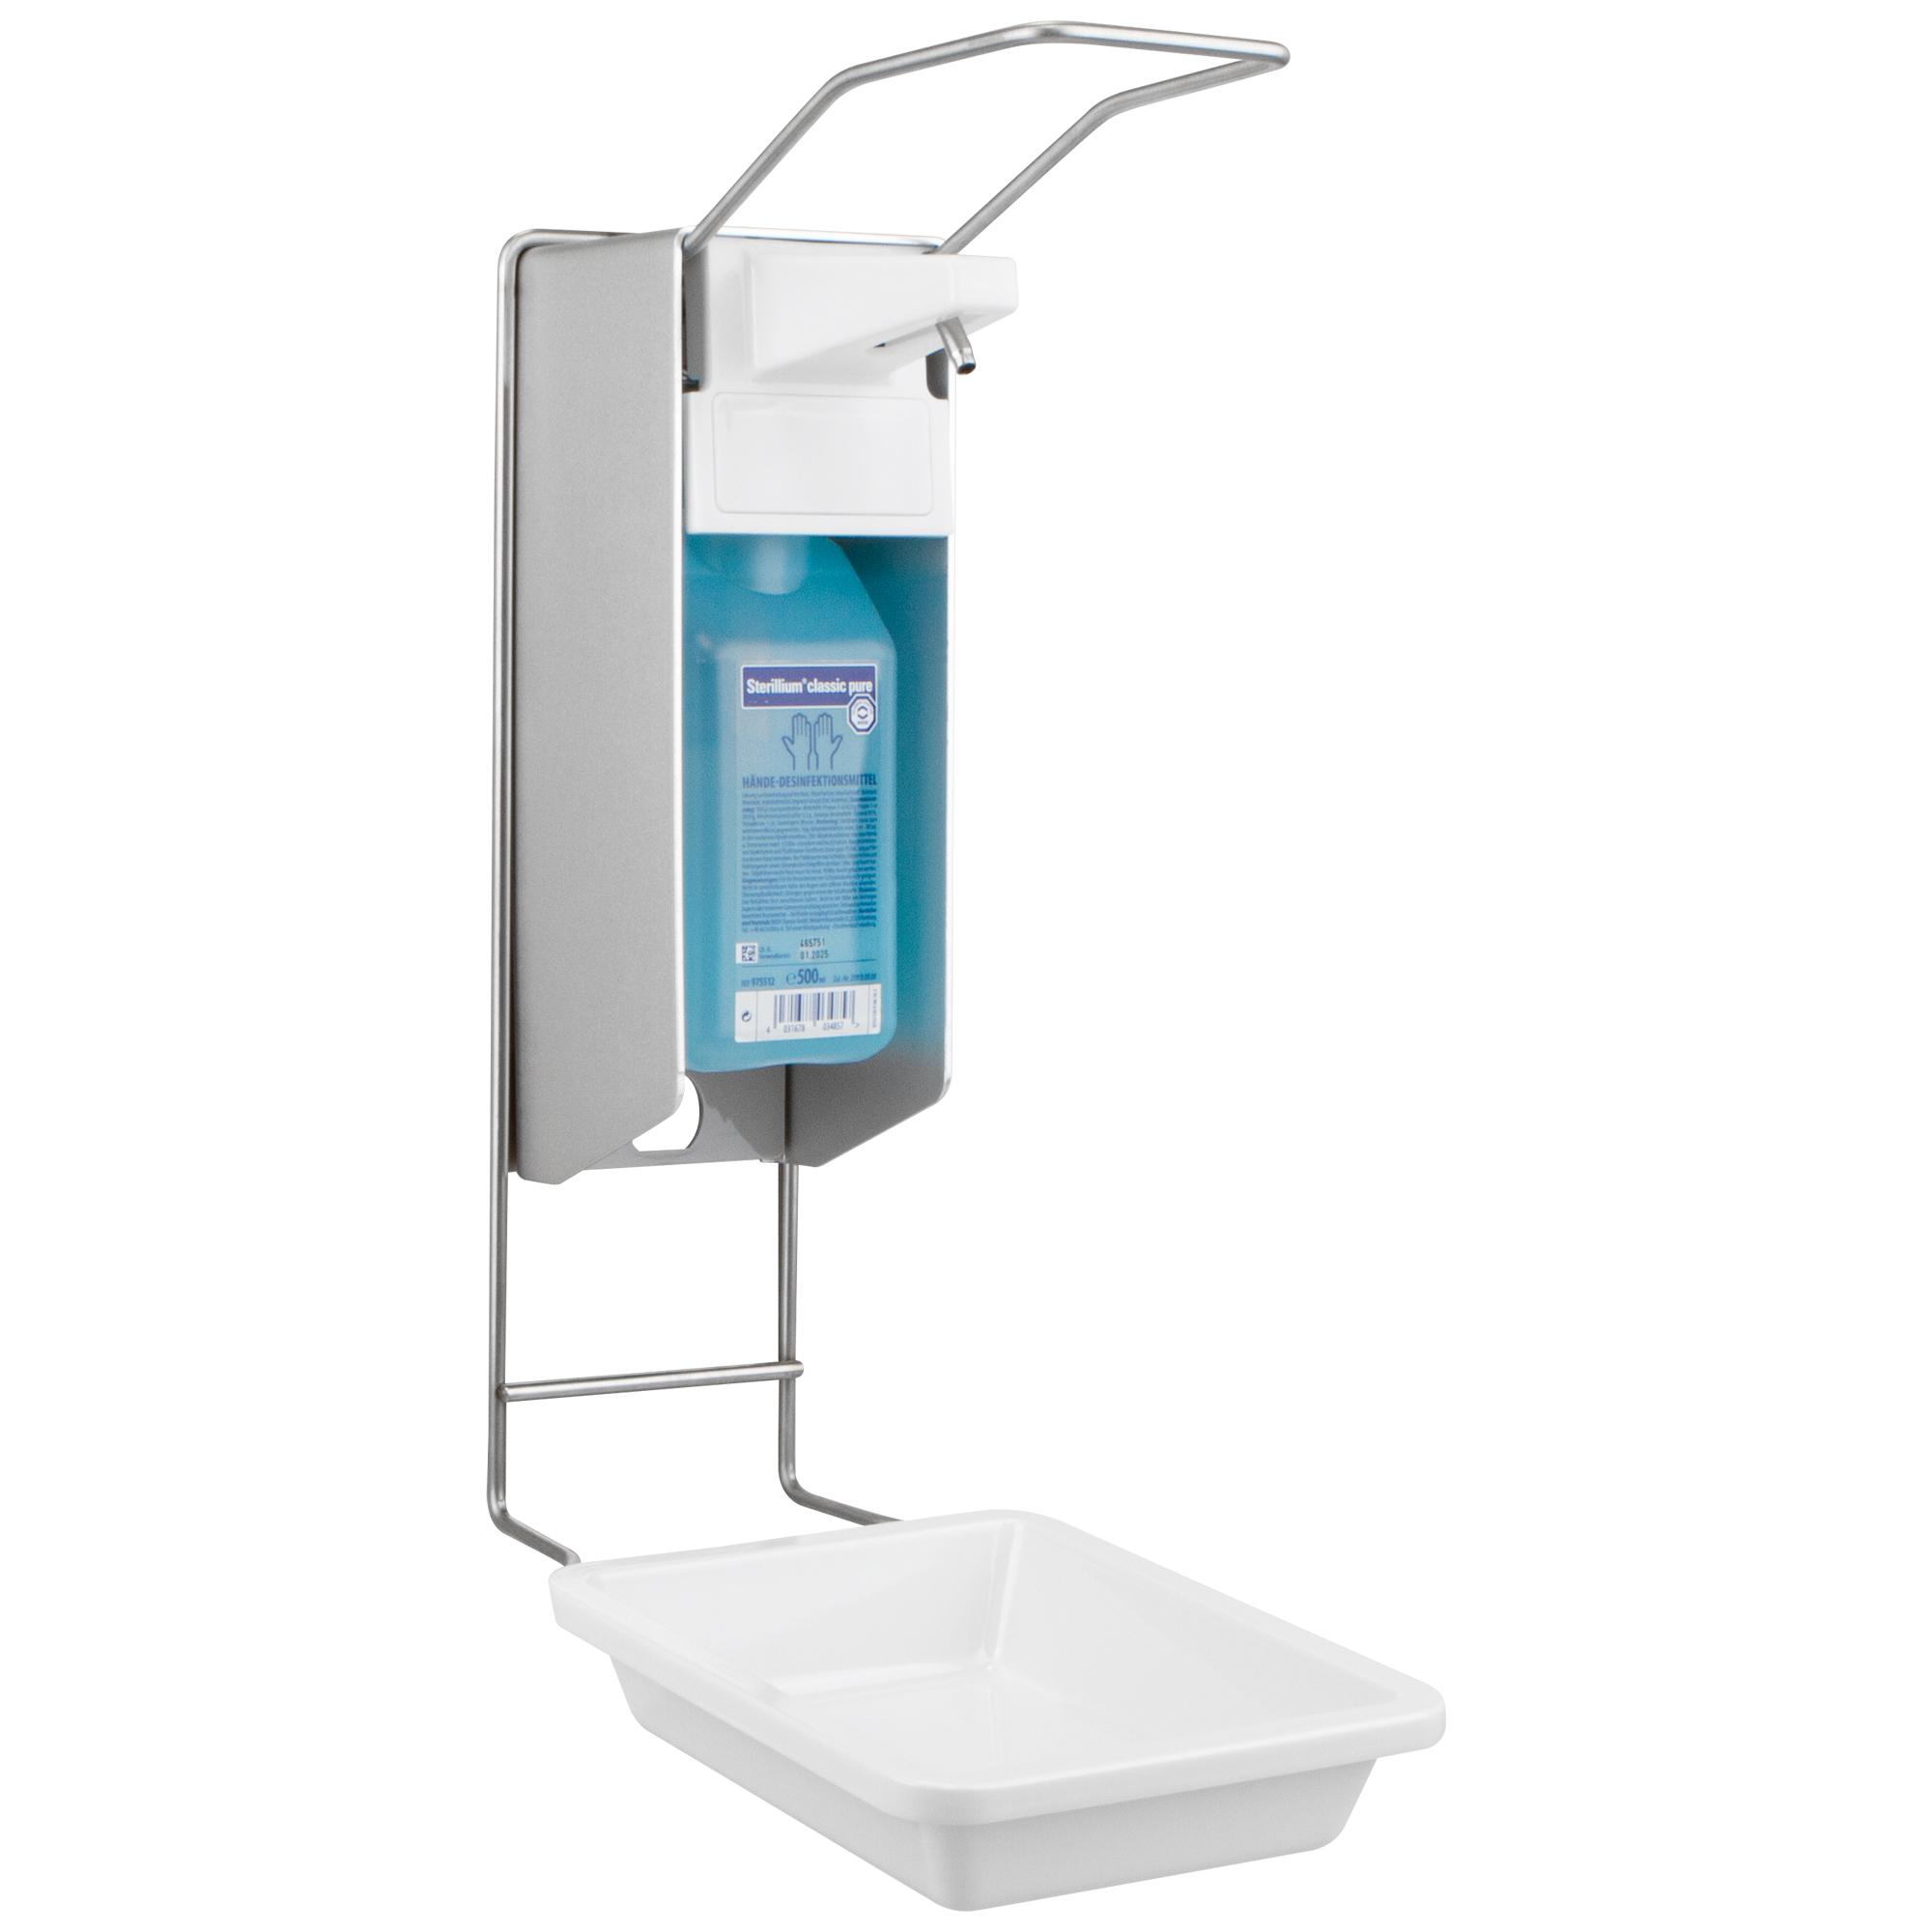 SANISMART Desinfektionsmittelspender + Tropfschale Kunststoff   eBay